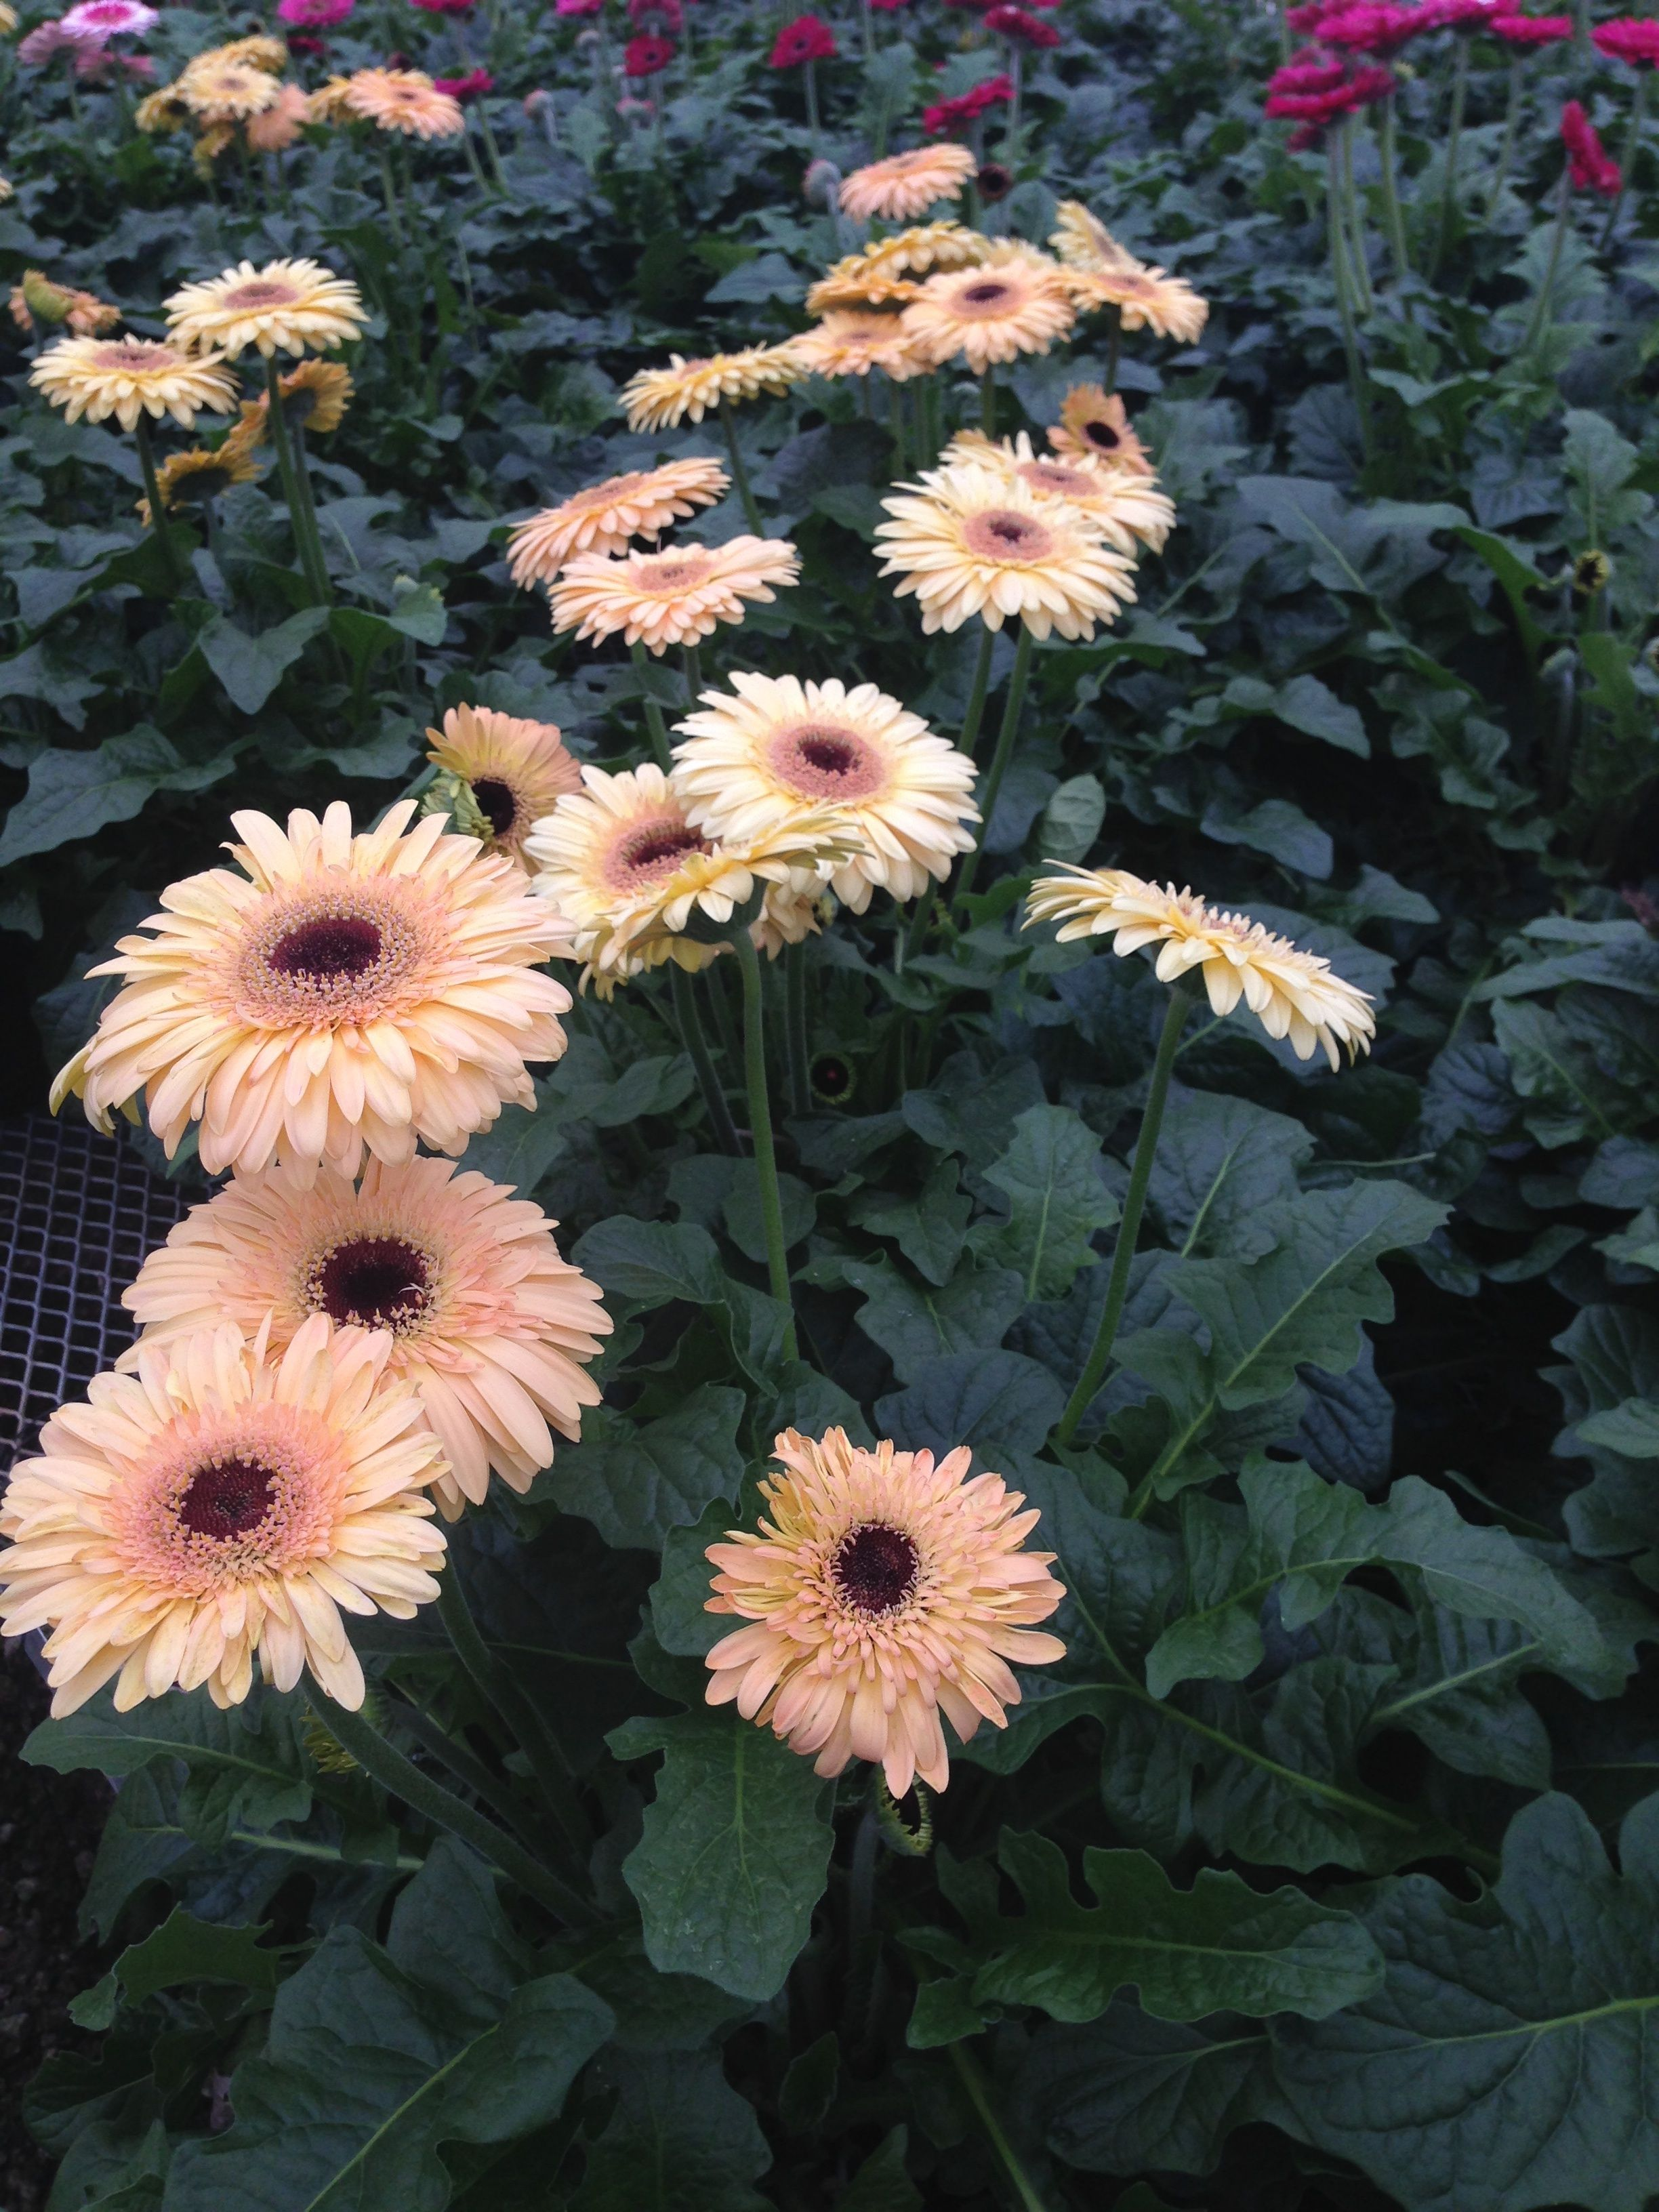 Pin By Klepac Greenhouses Inc On Gerbera Daisies Day Lilies Gerbera Daisy Gerbera